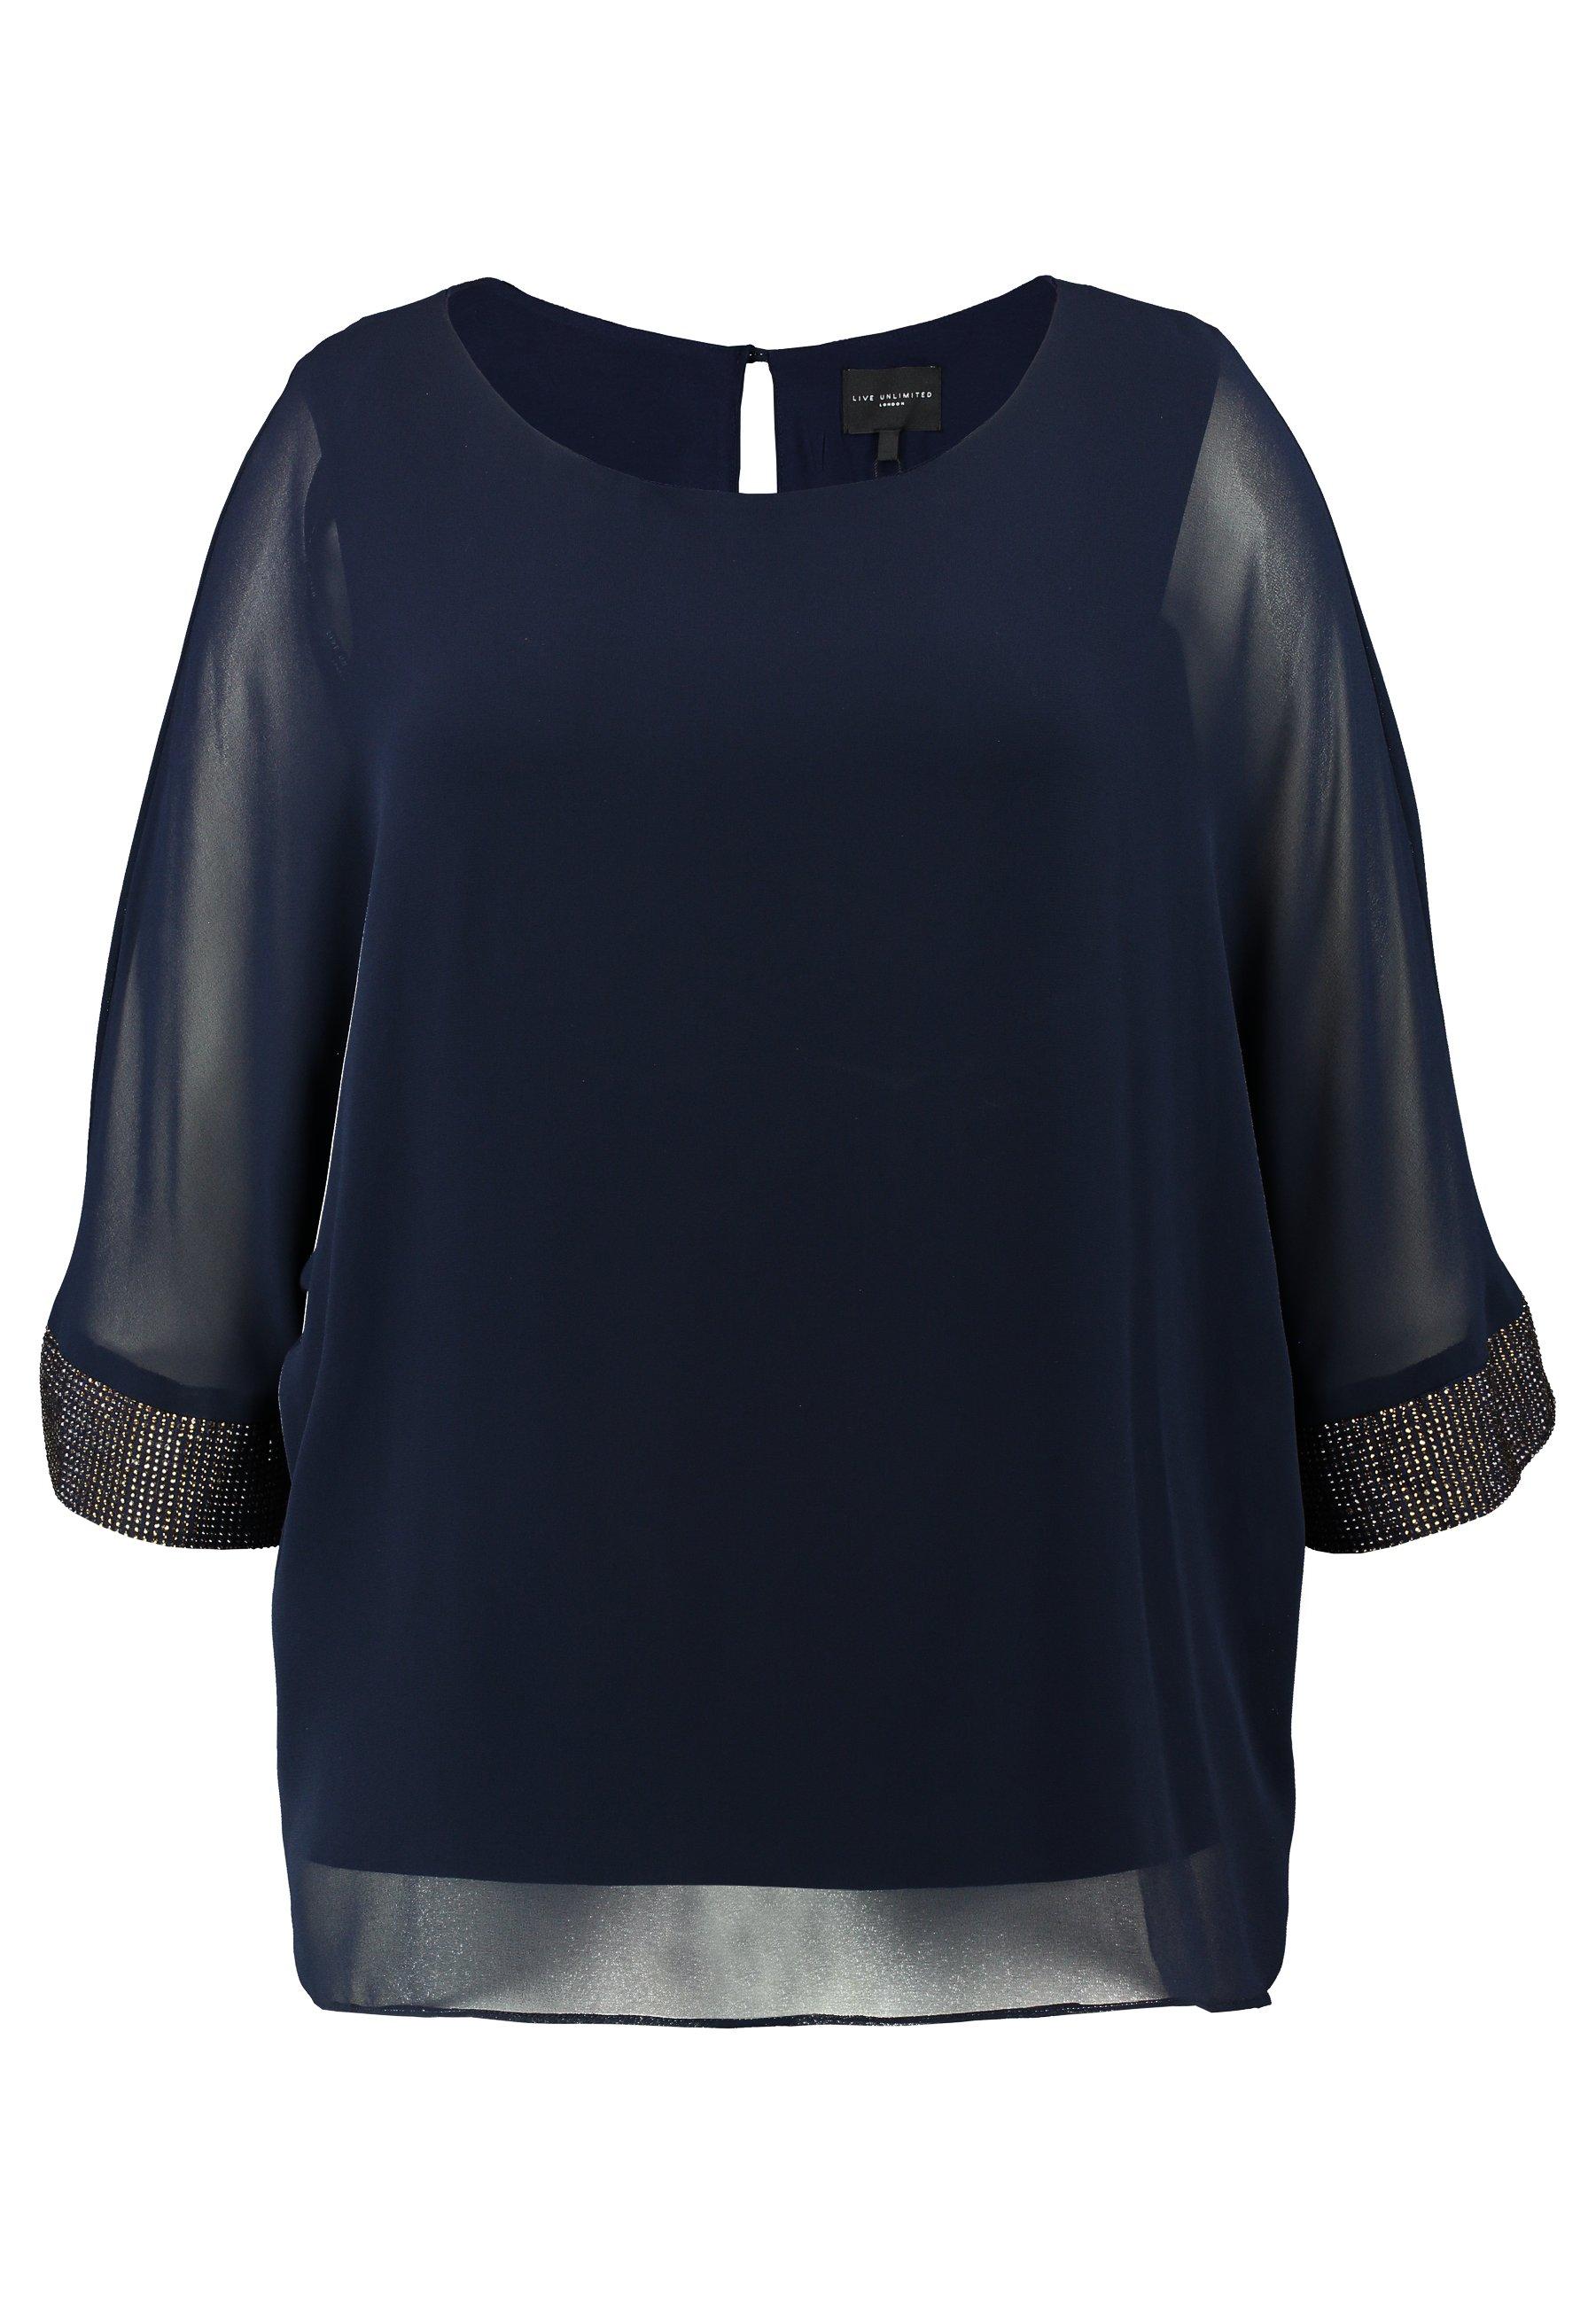 Live Unlimited London Dolman Sleeve Blouse - Bluser Navy